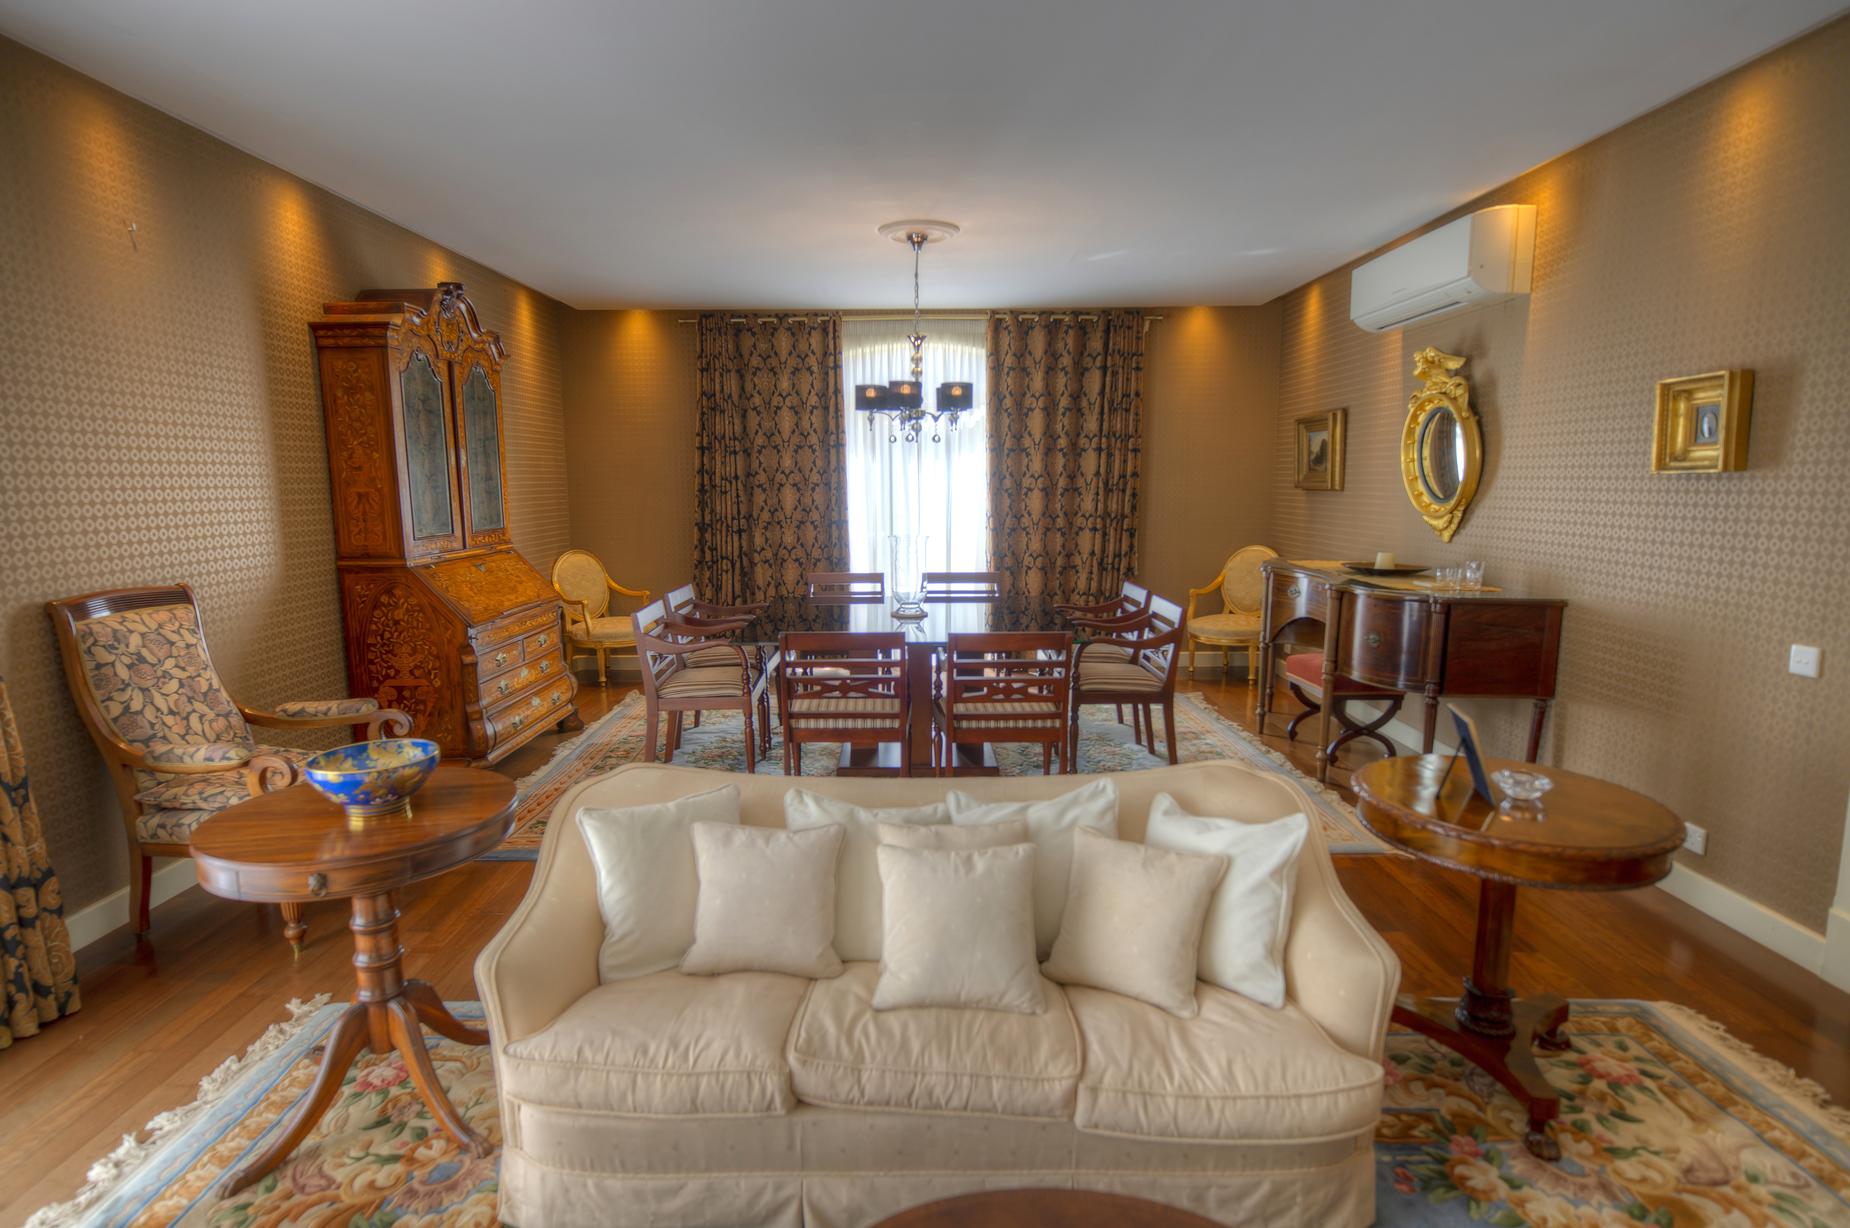 4 bed Villa For Rent in Iklin, Iklin - thumb 14